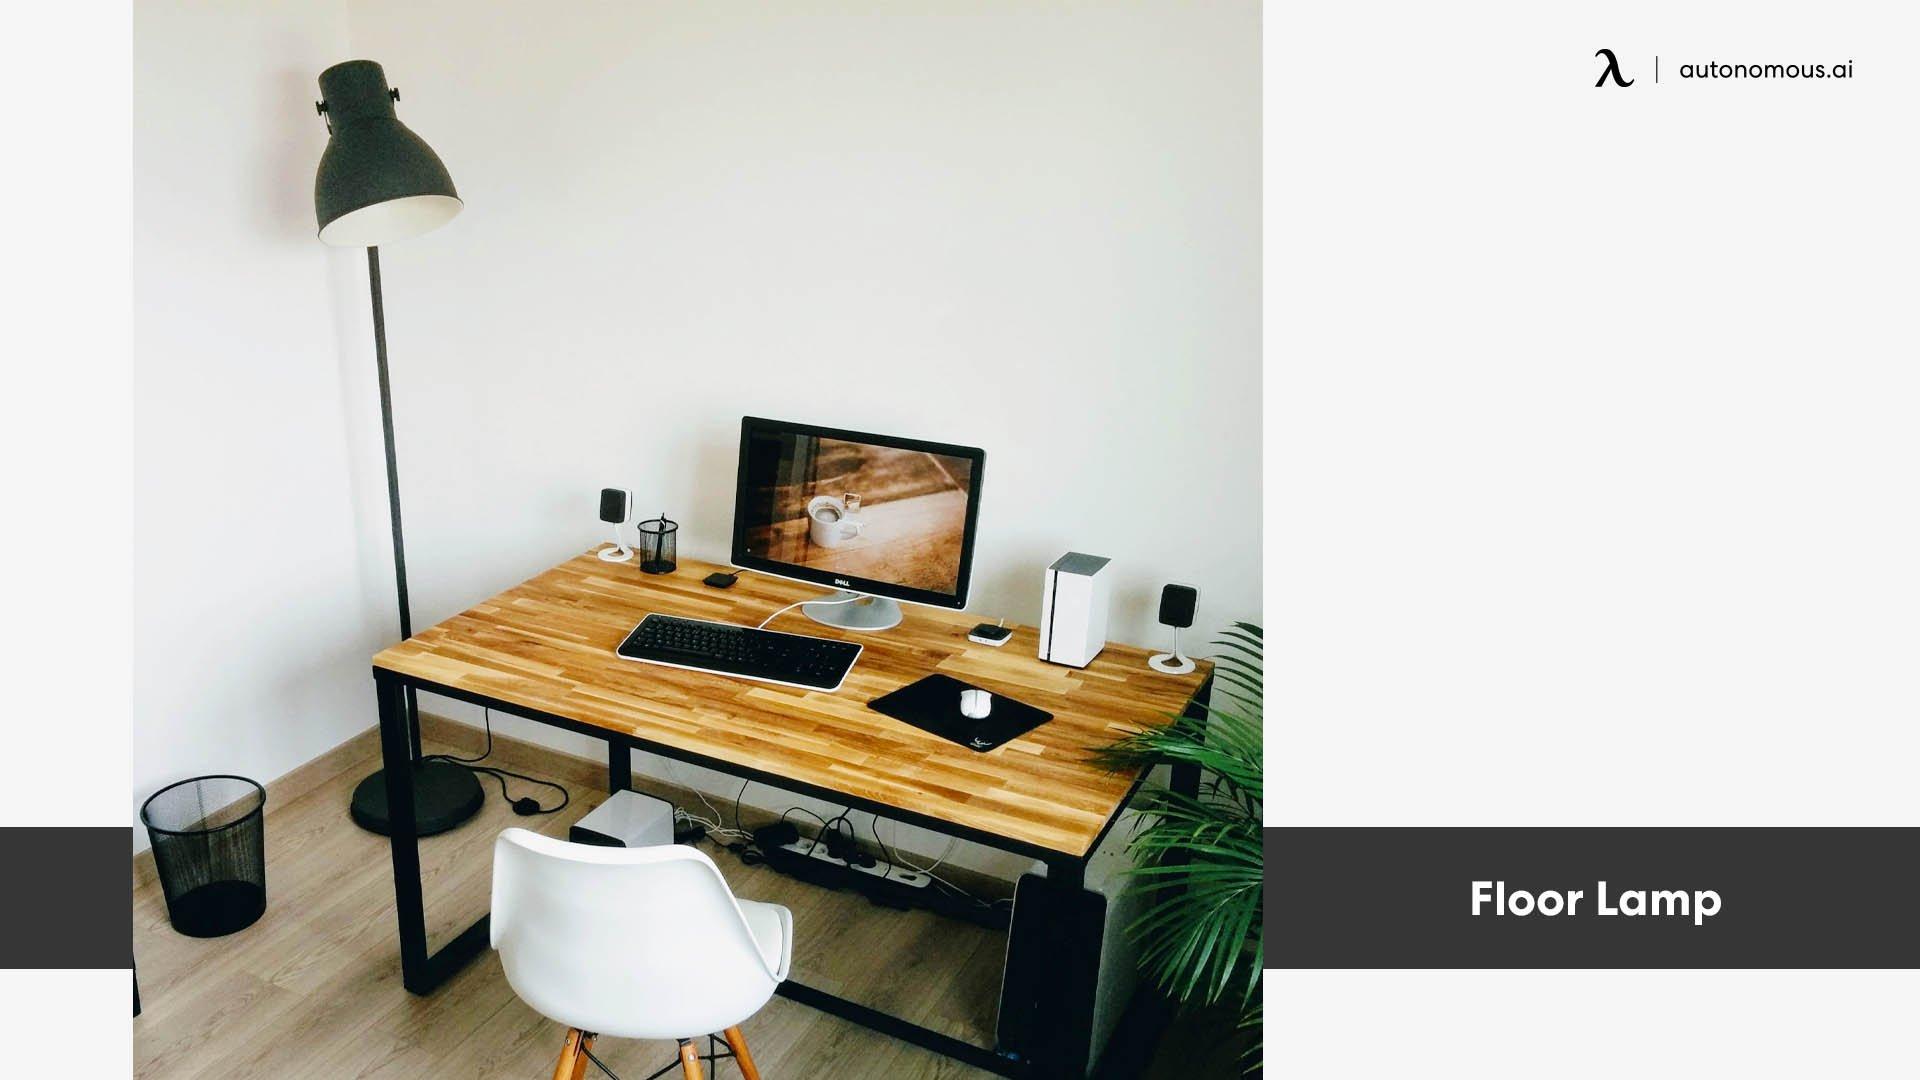 Photo of Floor Lamp